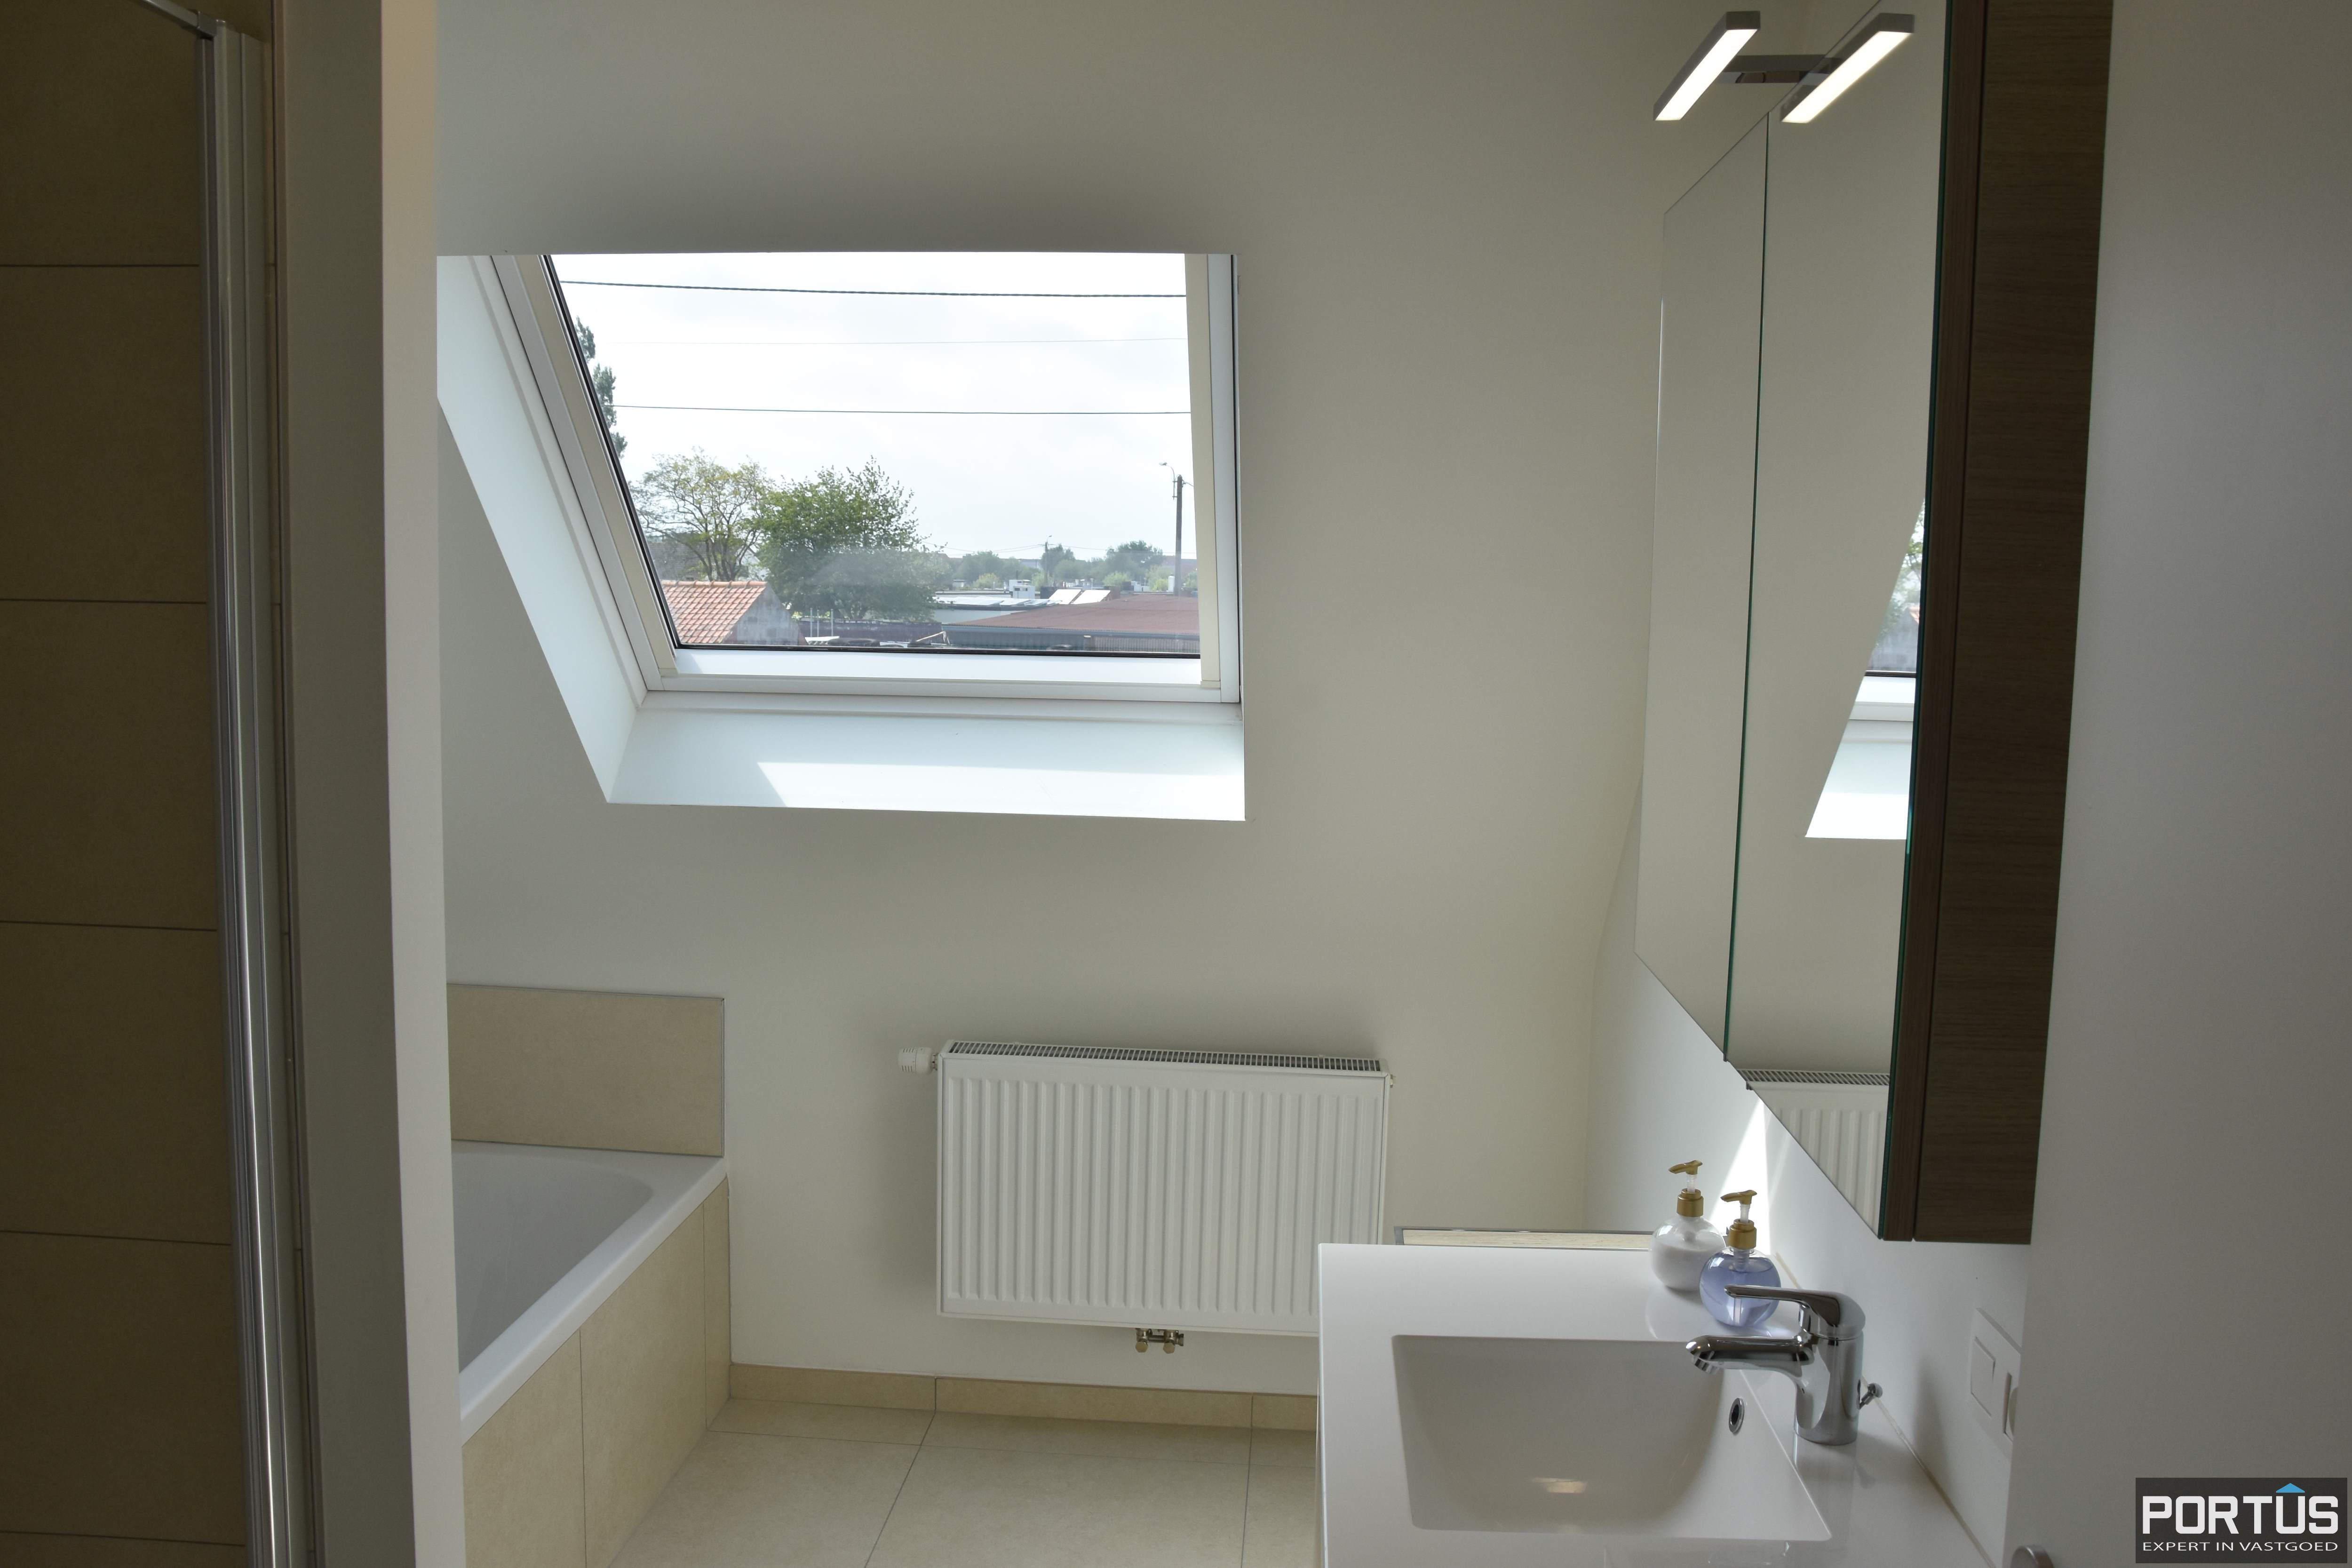 Recente villa te huur met 4 slaapkamers te Westende - 11242